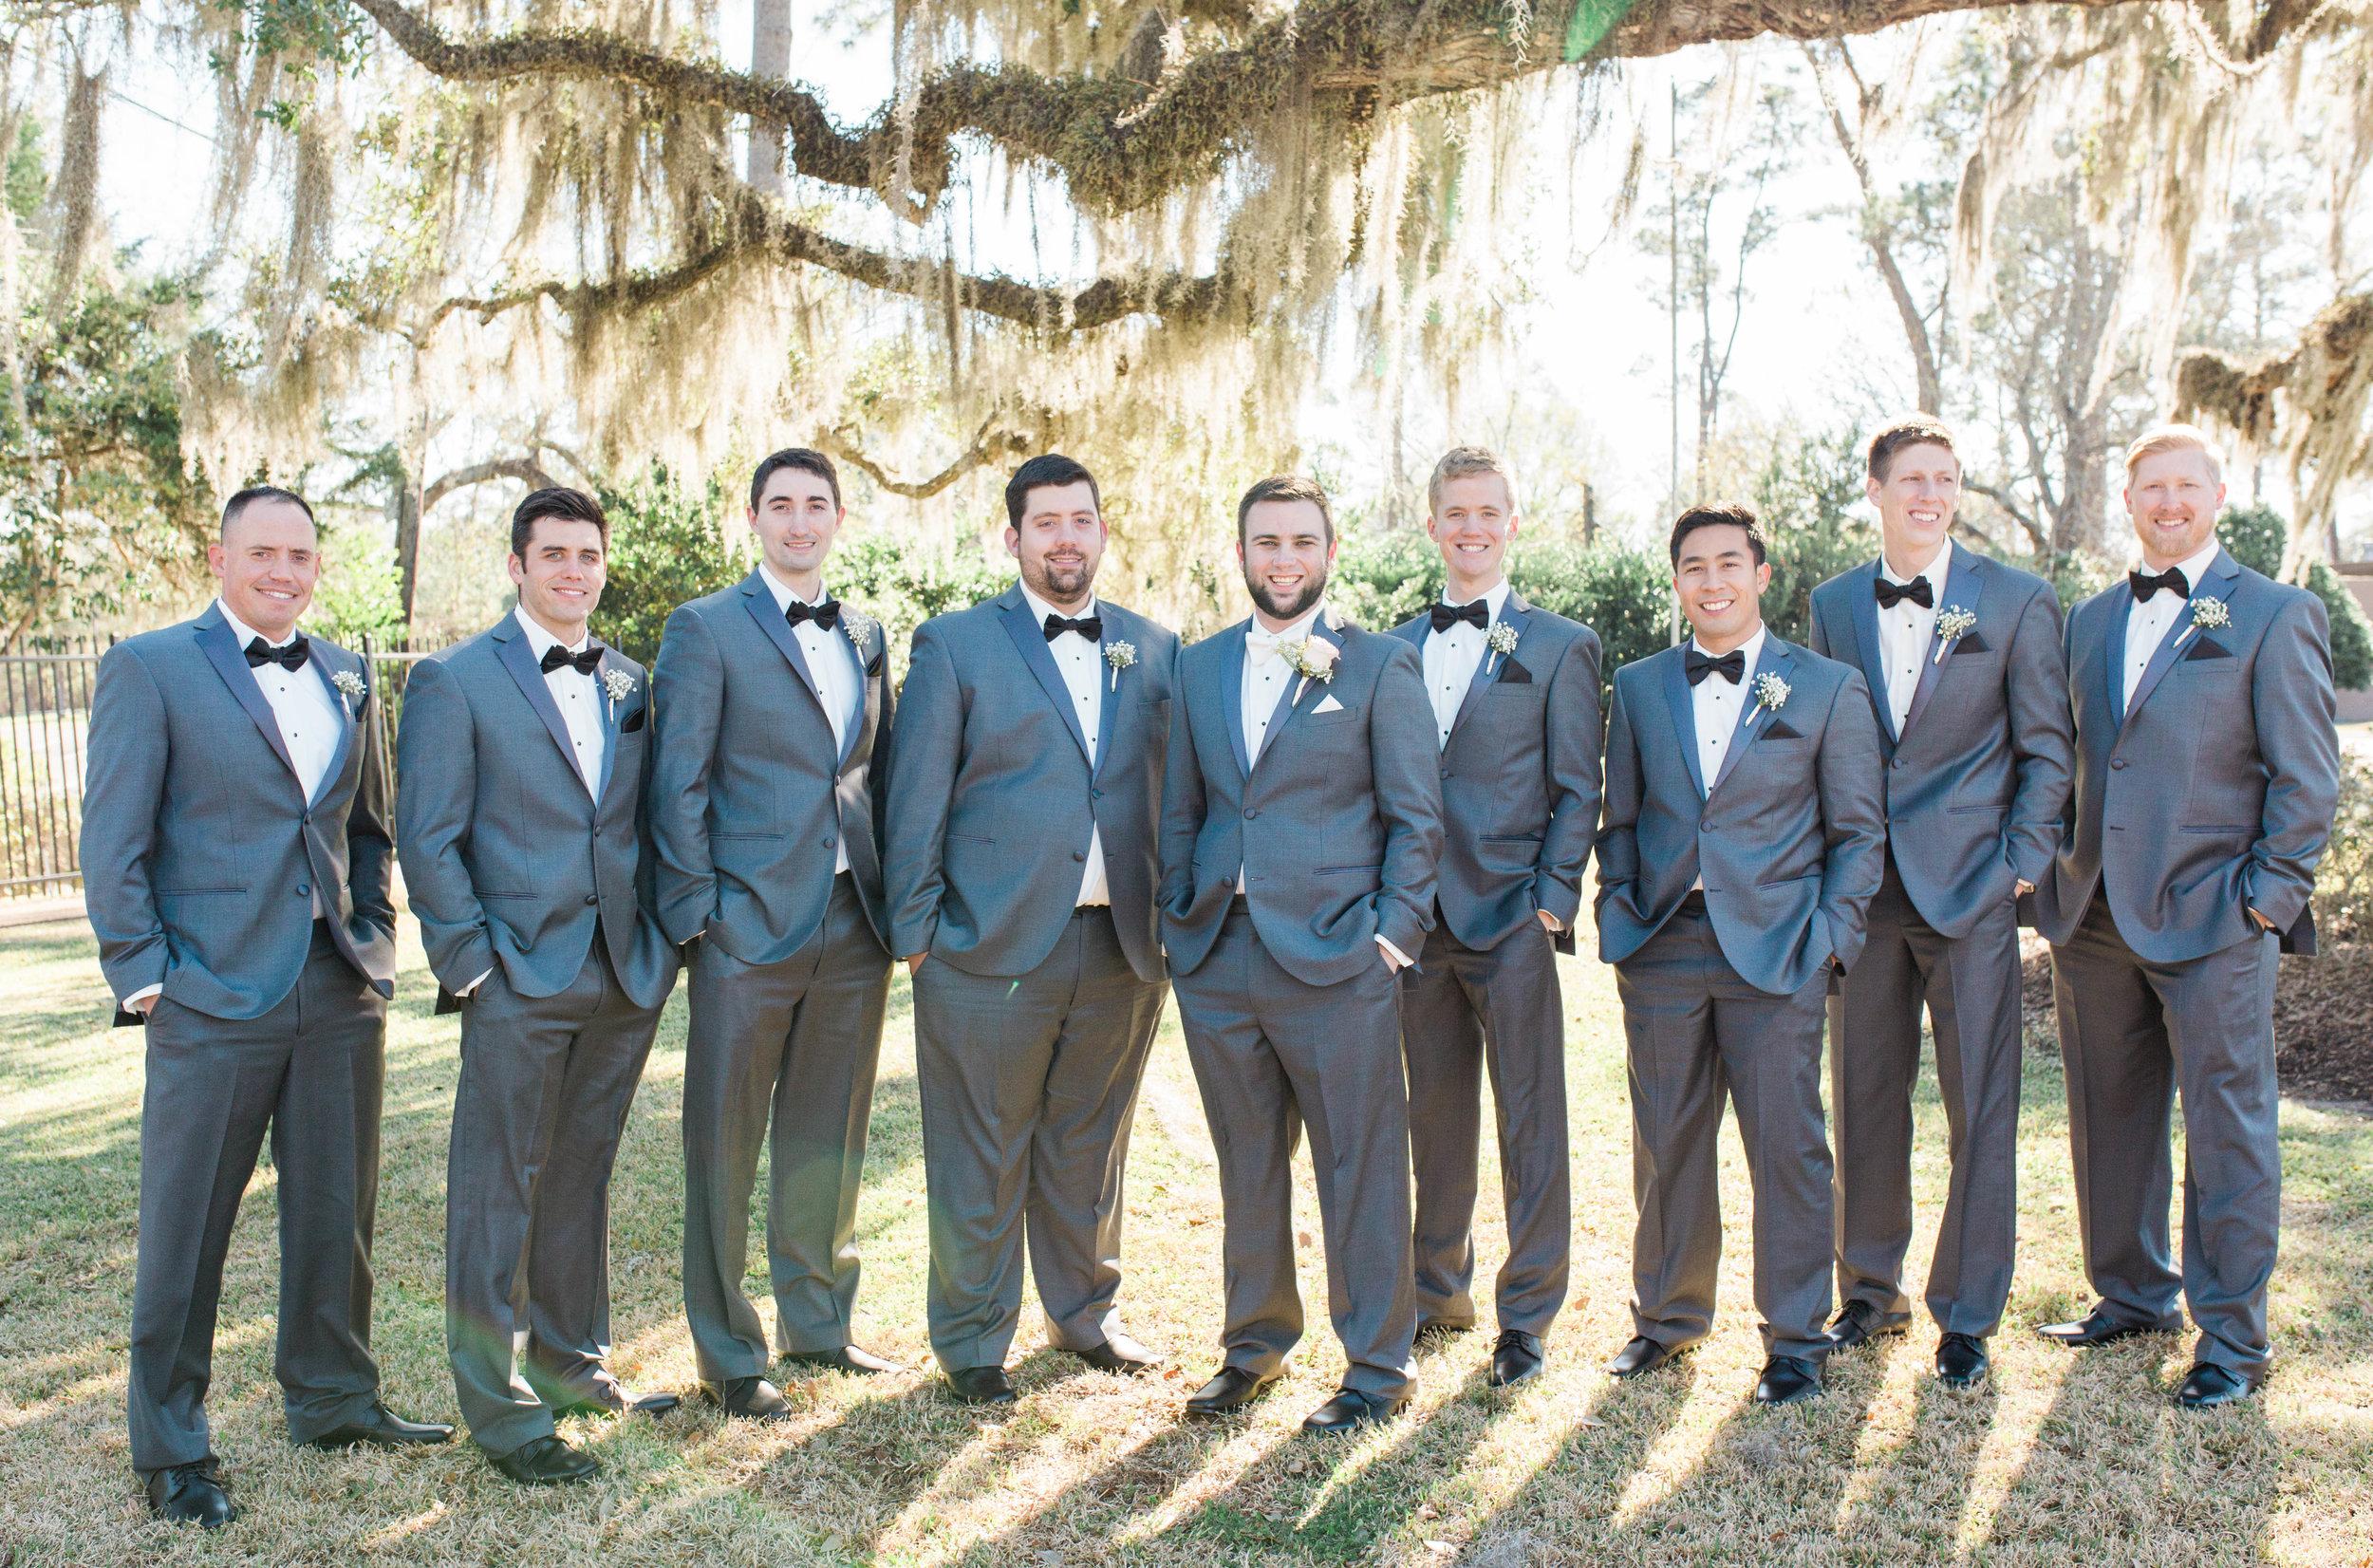 Beaumont Texas Country Club wedding-5570.jpg